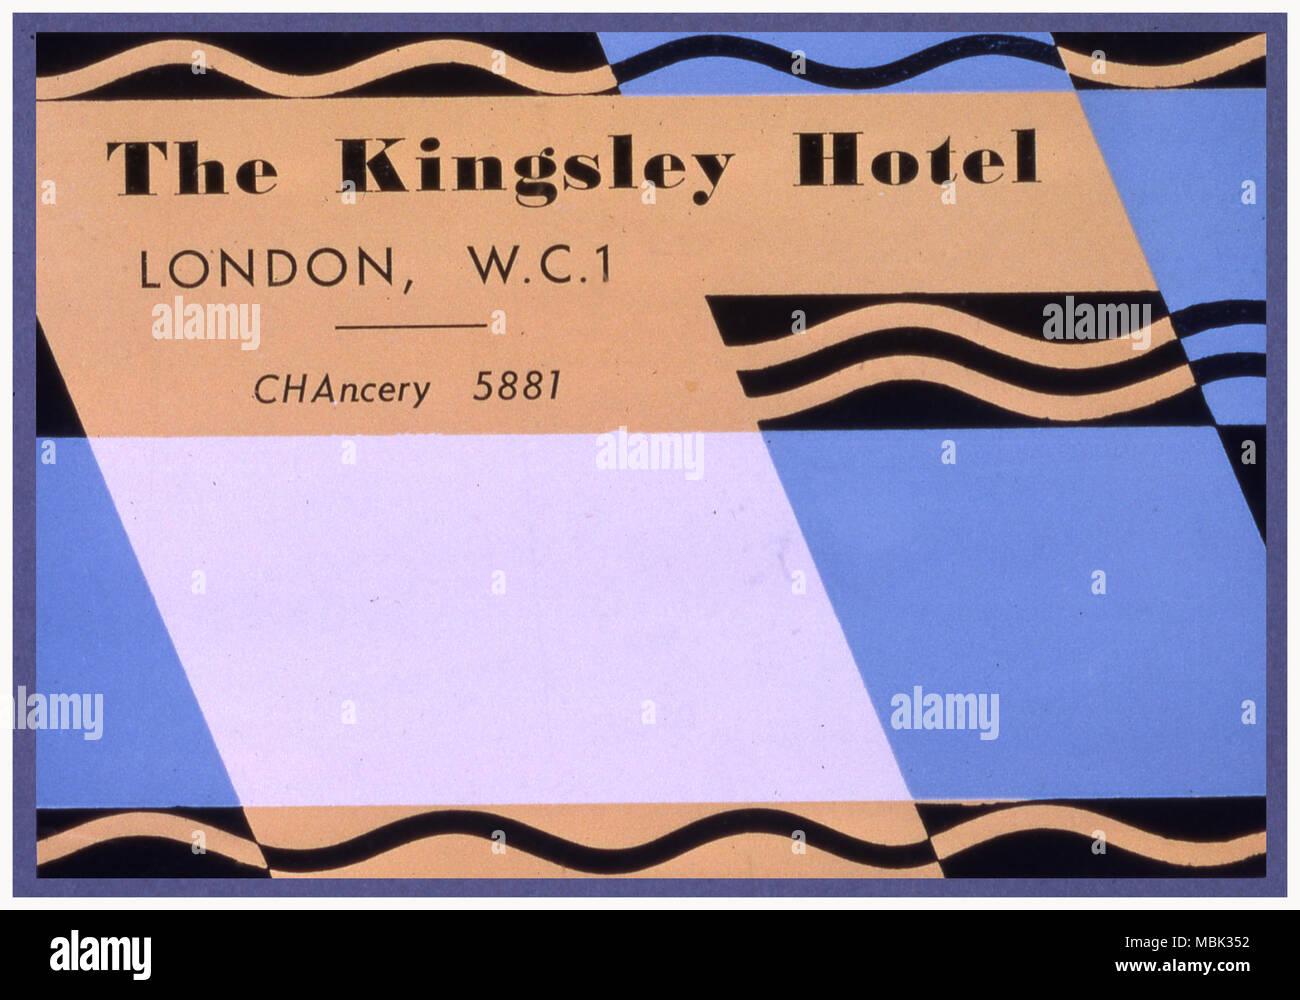 Kingsley Hotel - Stock Image